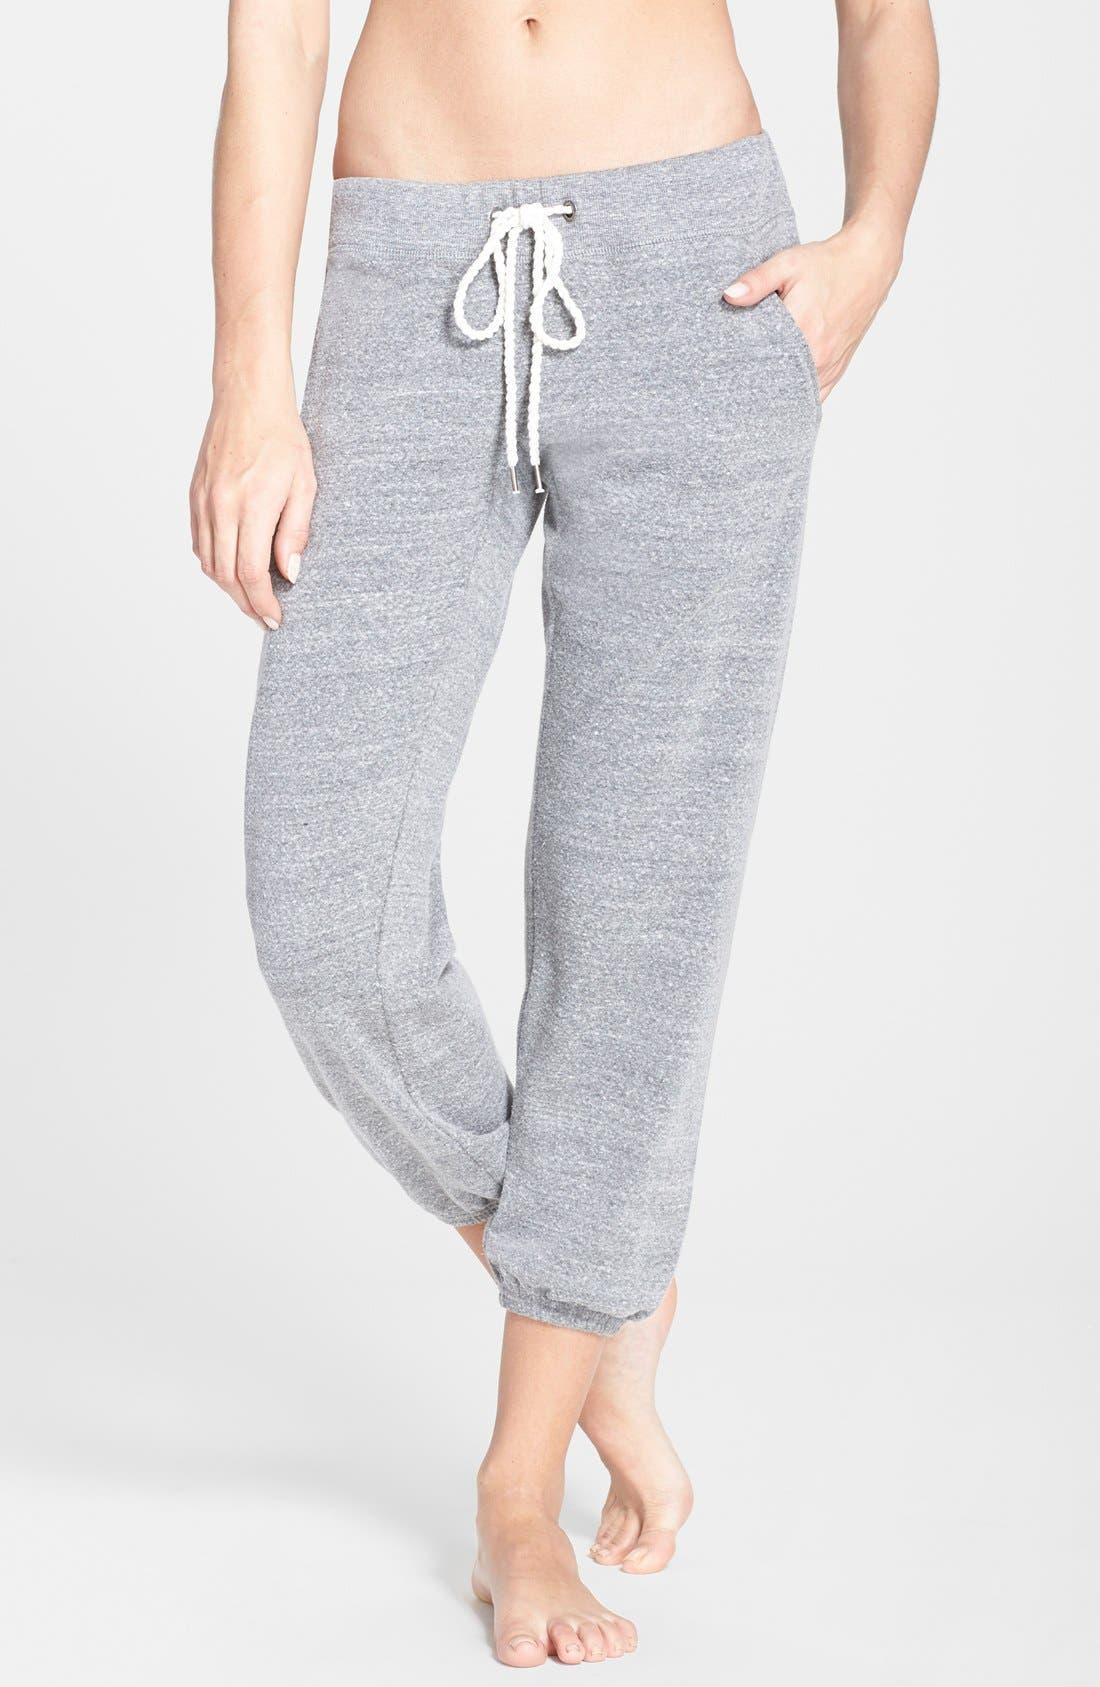 Main Image - Make + Model 'Weekend' Jogger Pants